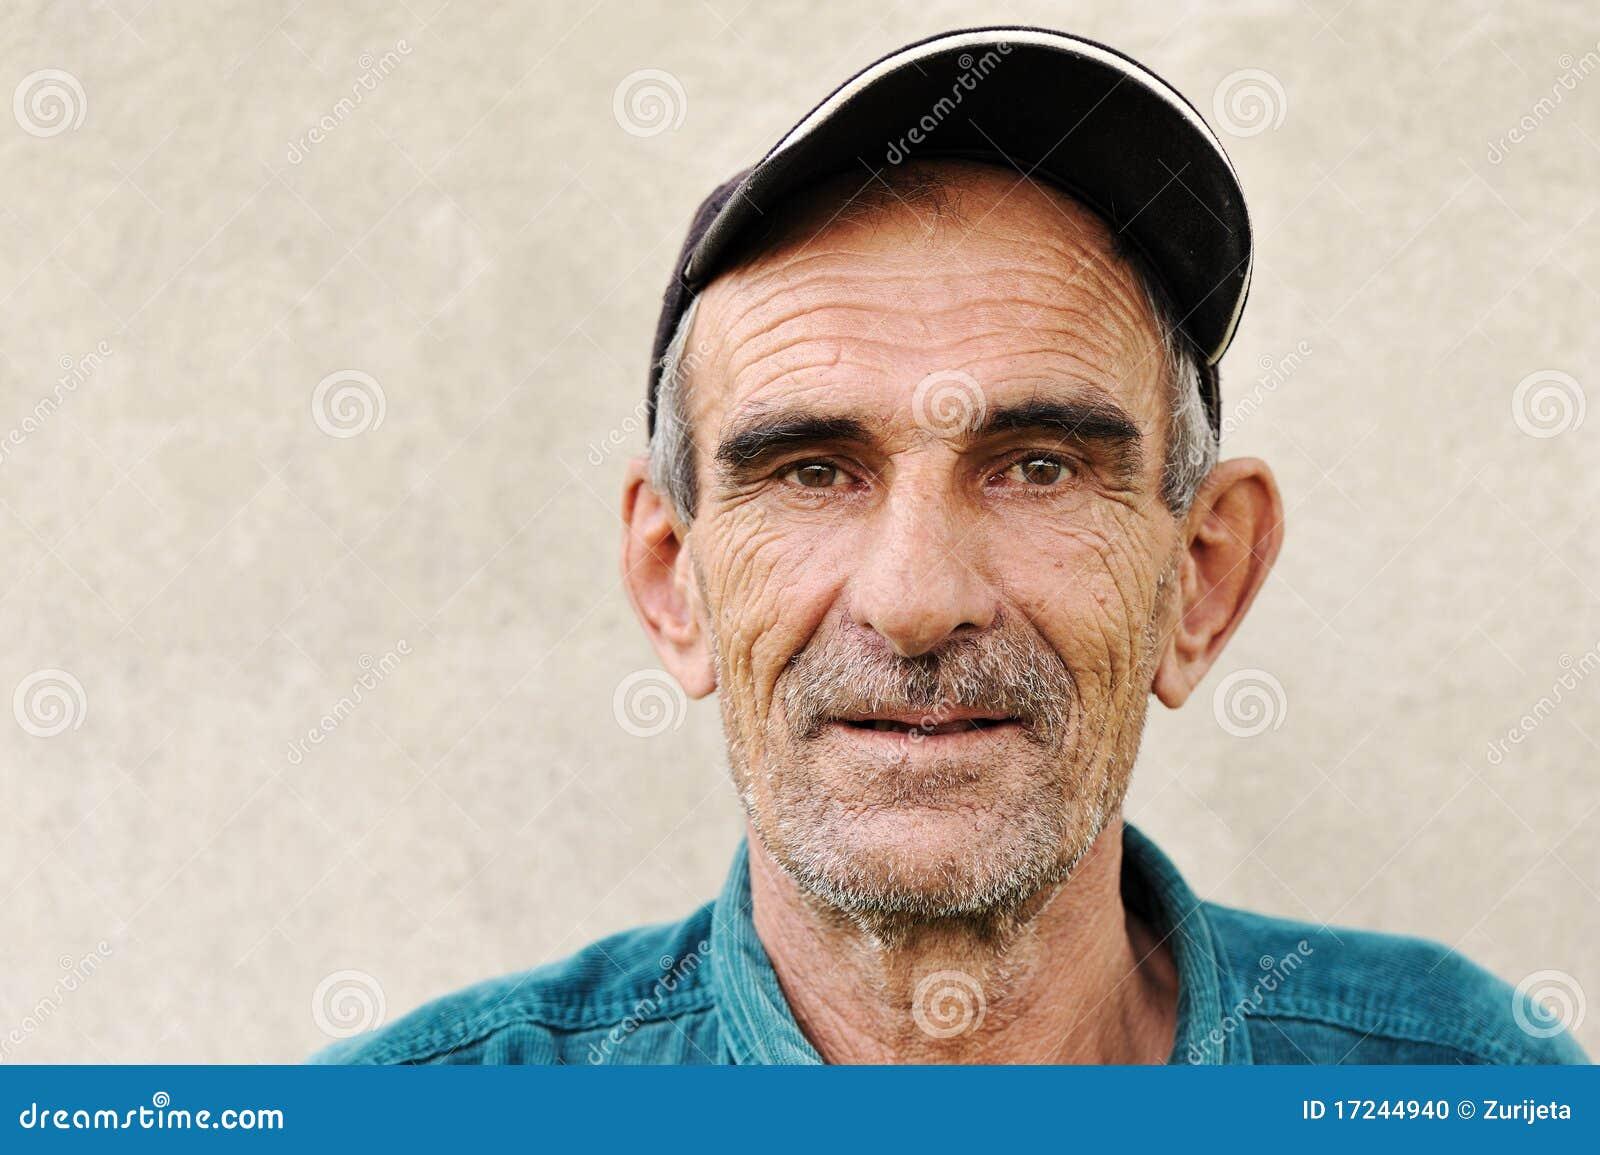 Elderly, old, mature man with hat